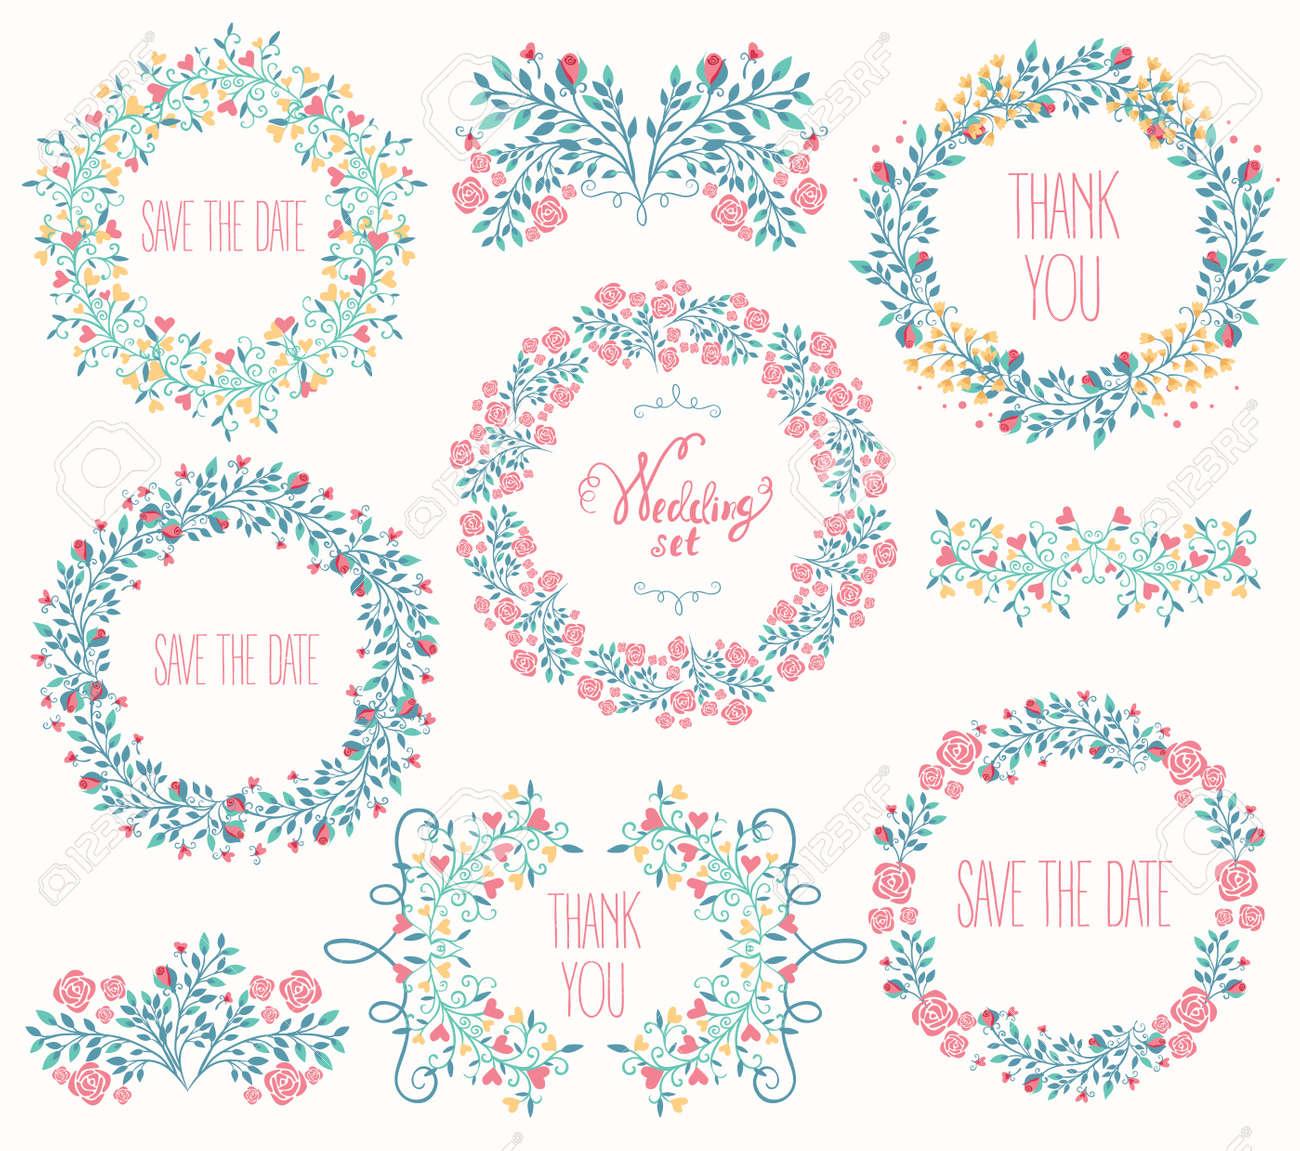 Floral Frame Collection. Wedding set flowers, wreaths. Vector illustration - 53458074